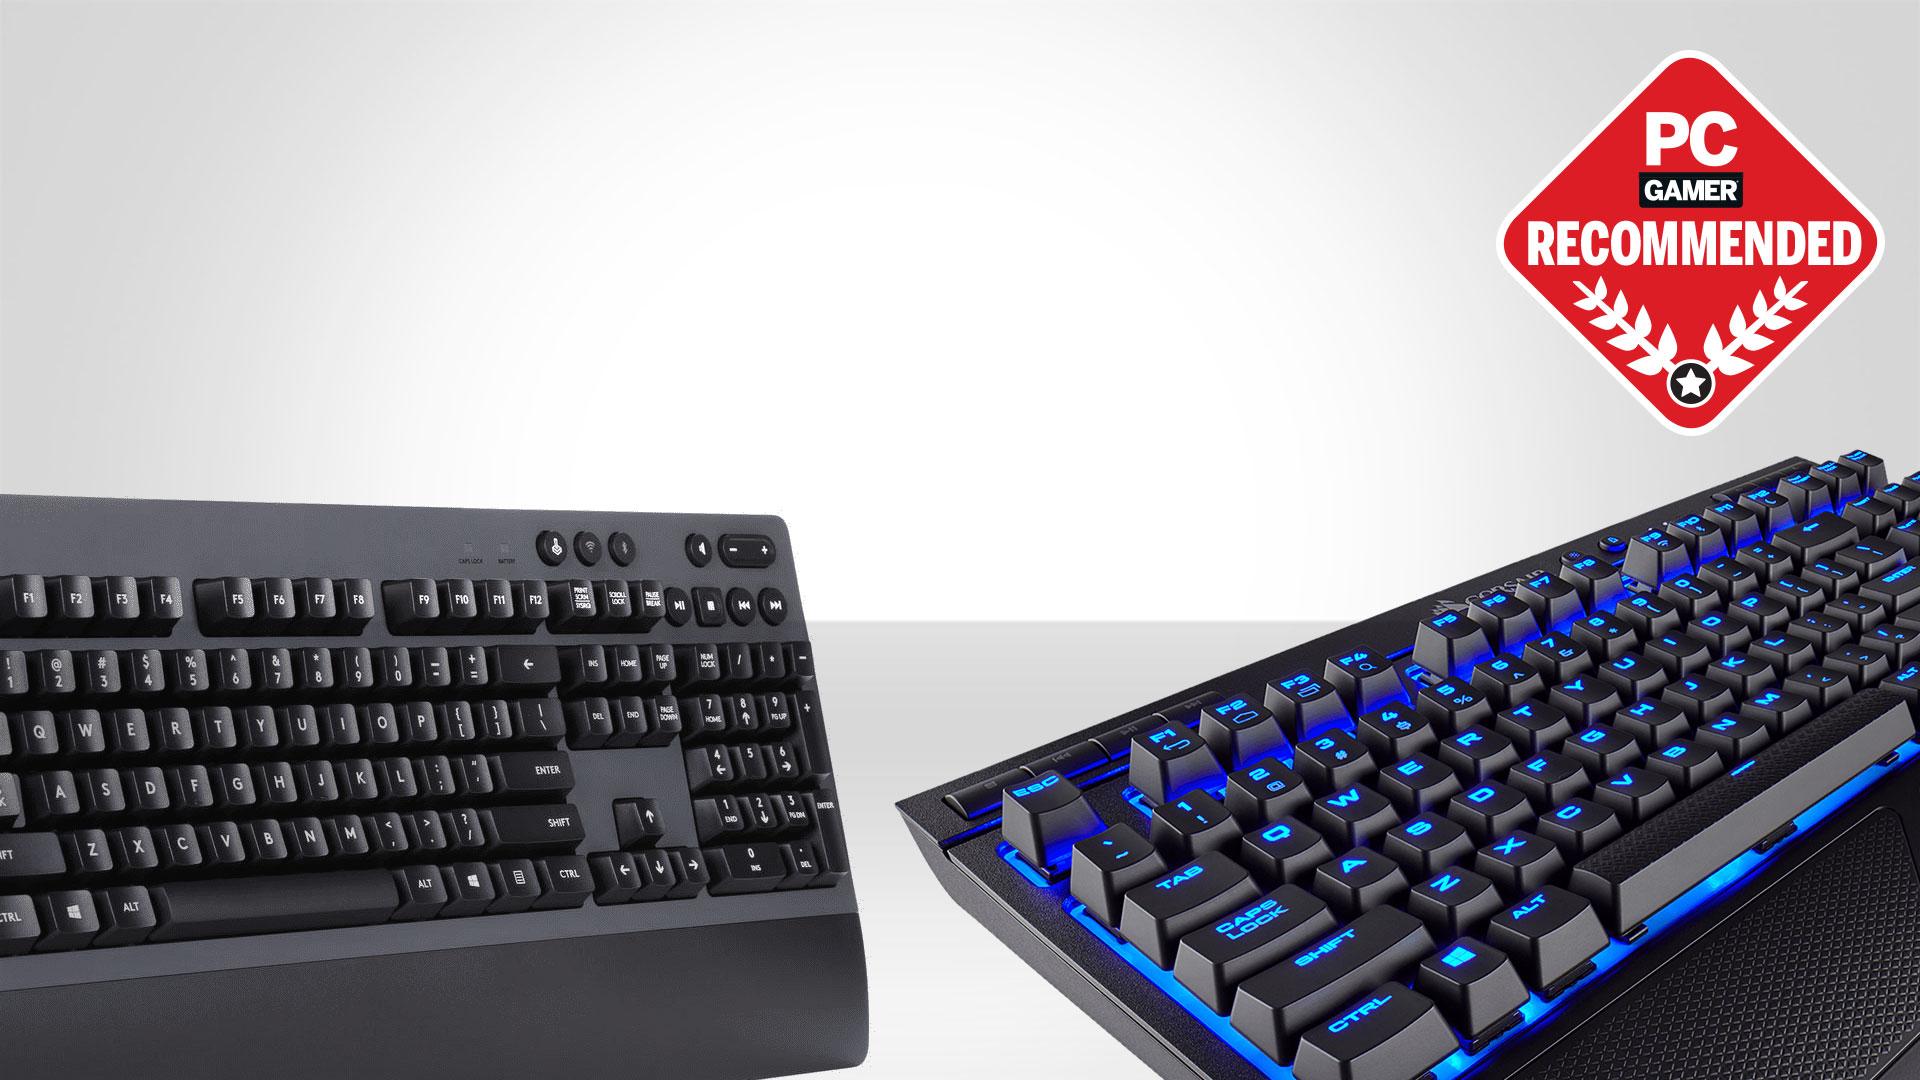 The best wireless gaming keyboard in 2021